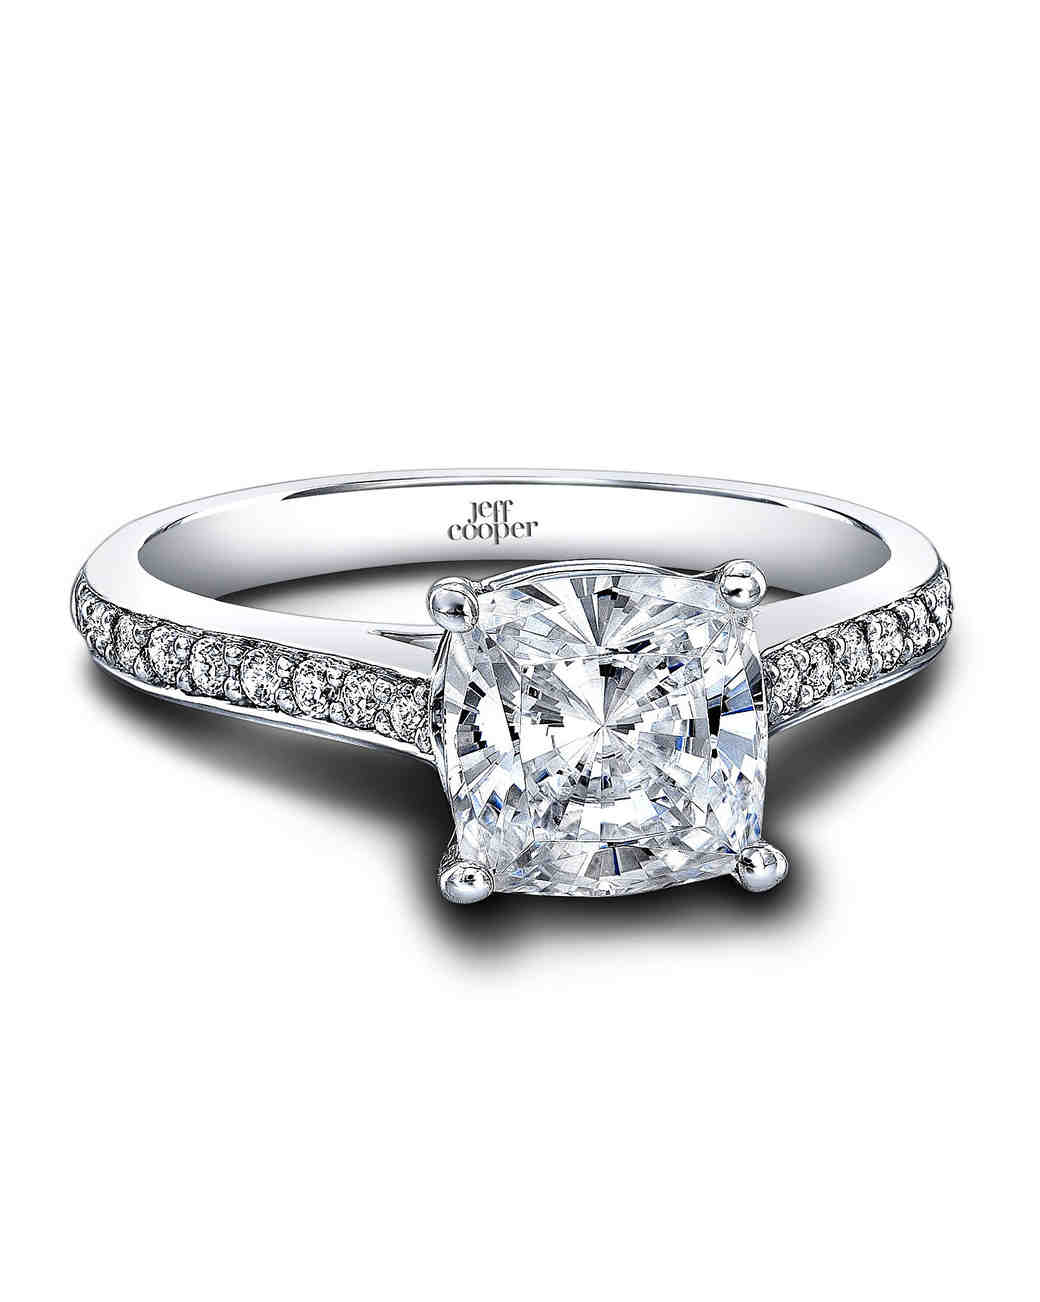 "Jeff Cooper Designs ""Caitlyn""Cushion-Cut Diamond Engagement Ring"